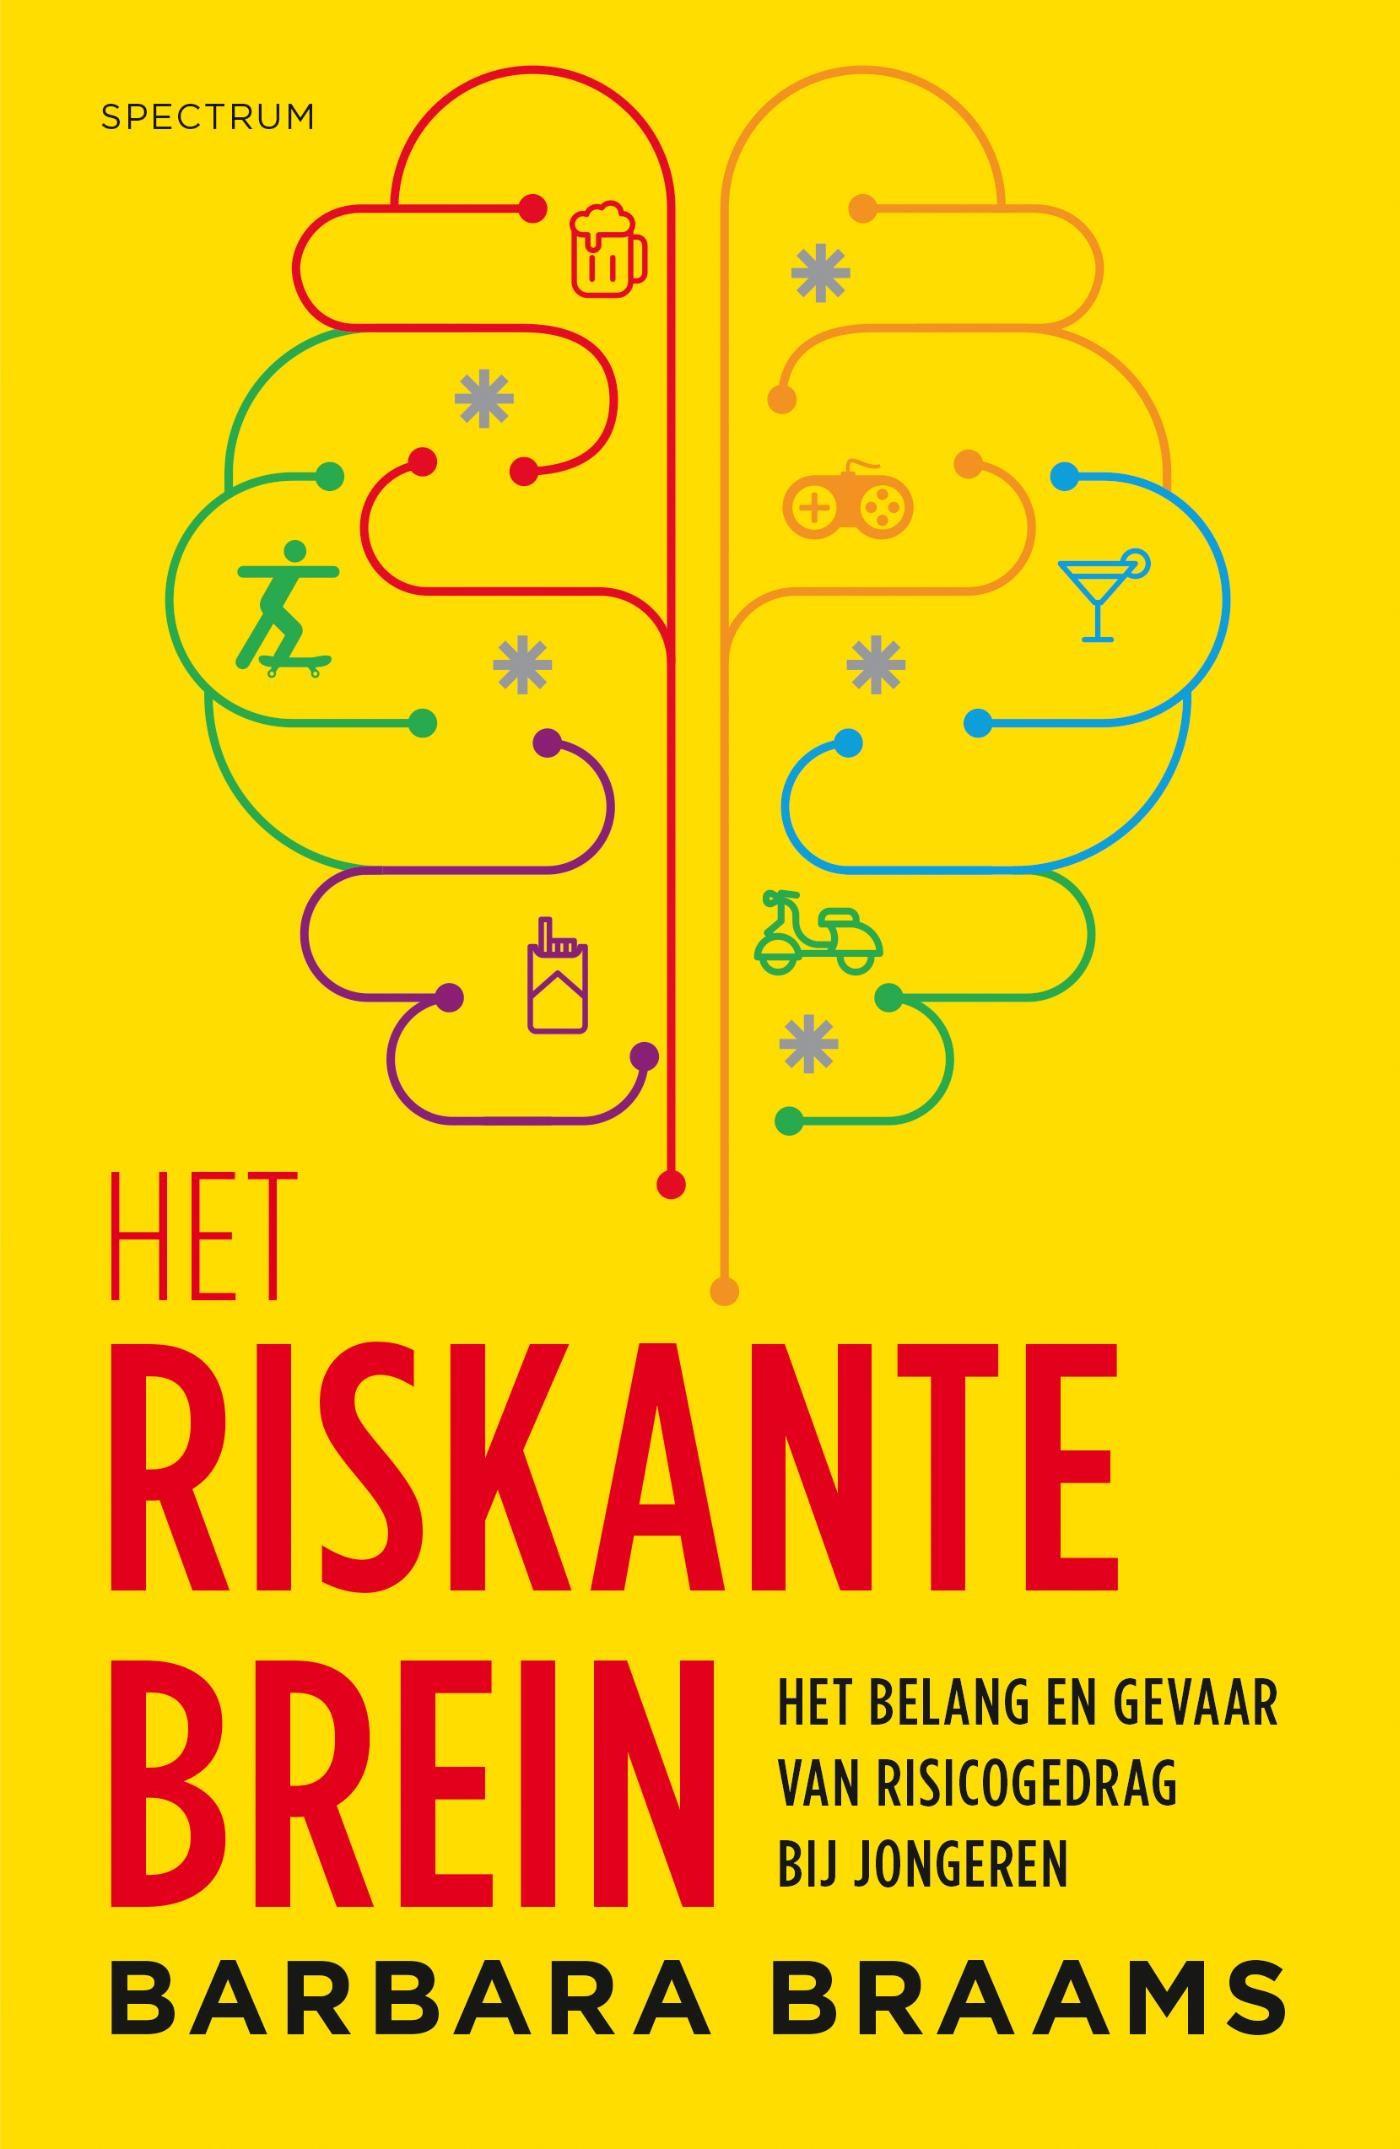 Boekcover - Het riskante brein